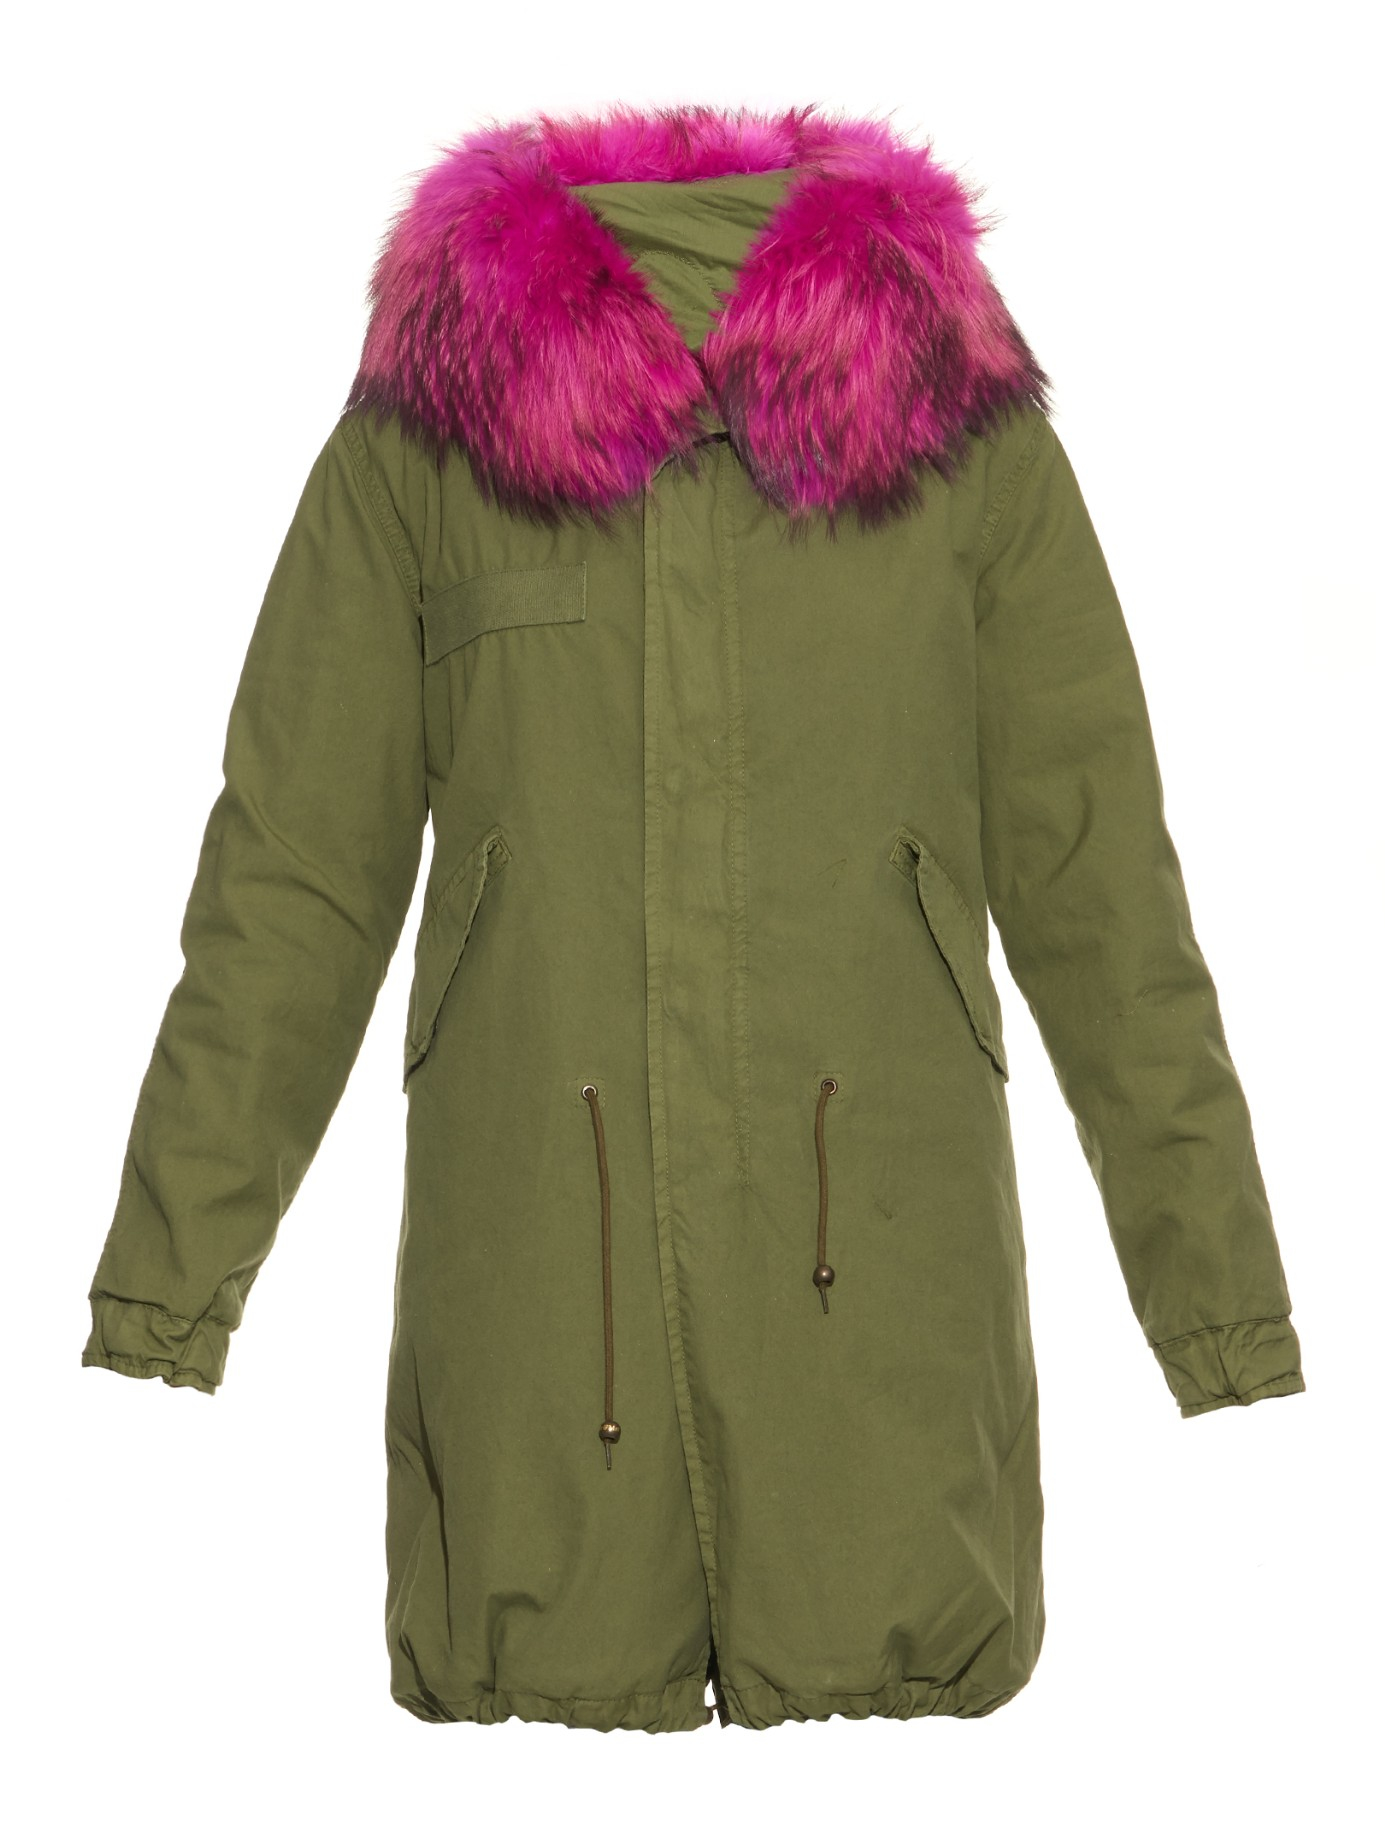 Cotton Jacket Women S